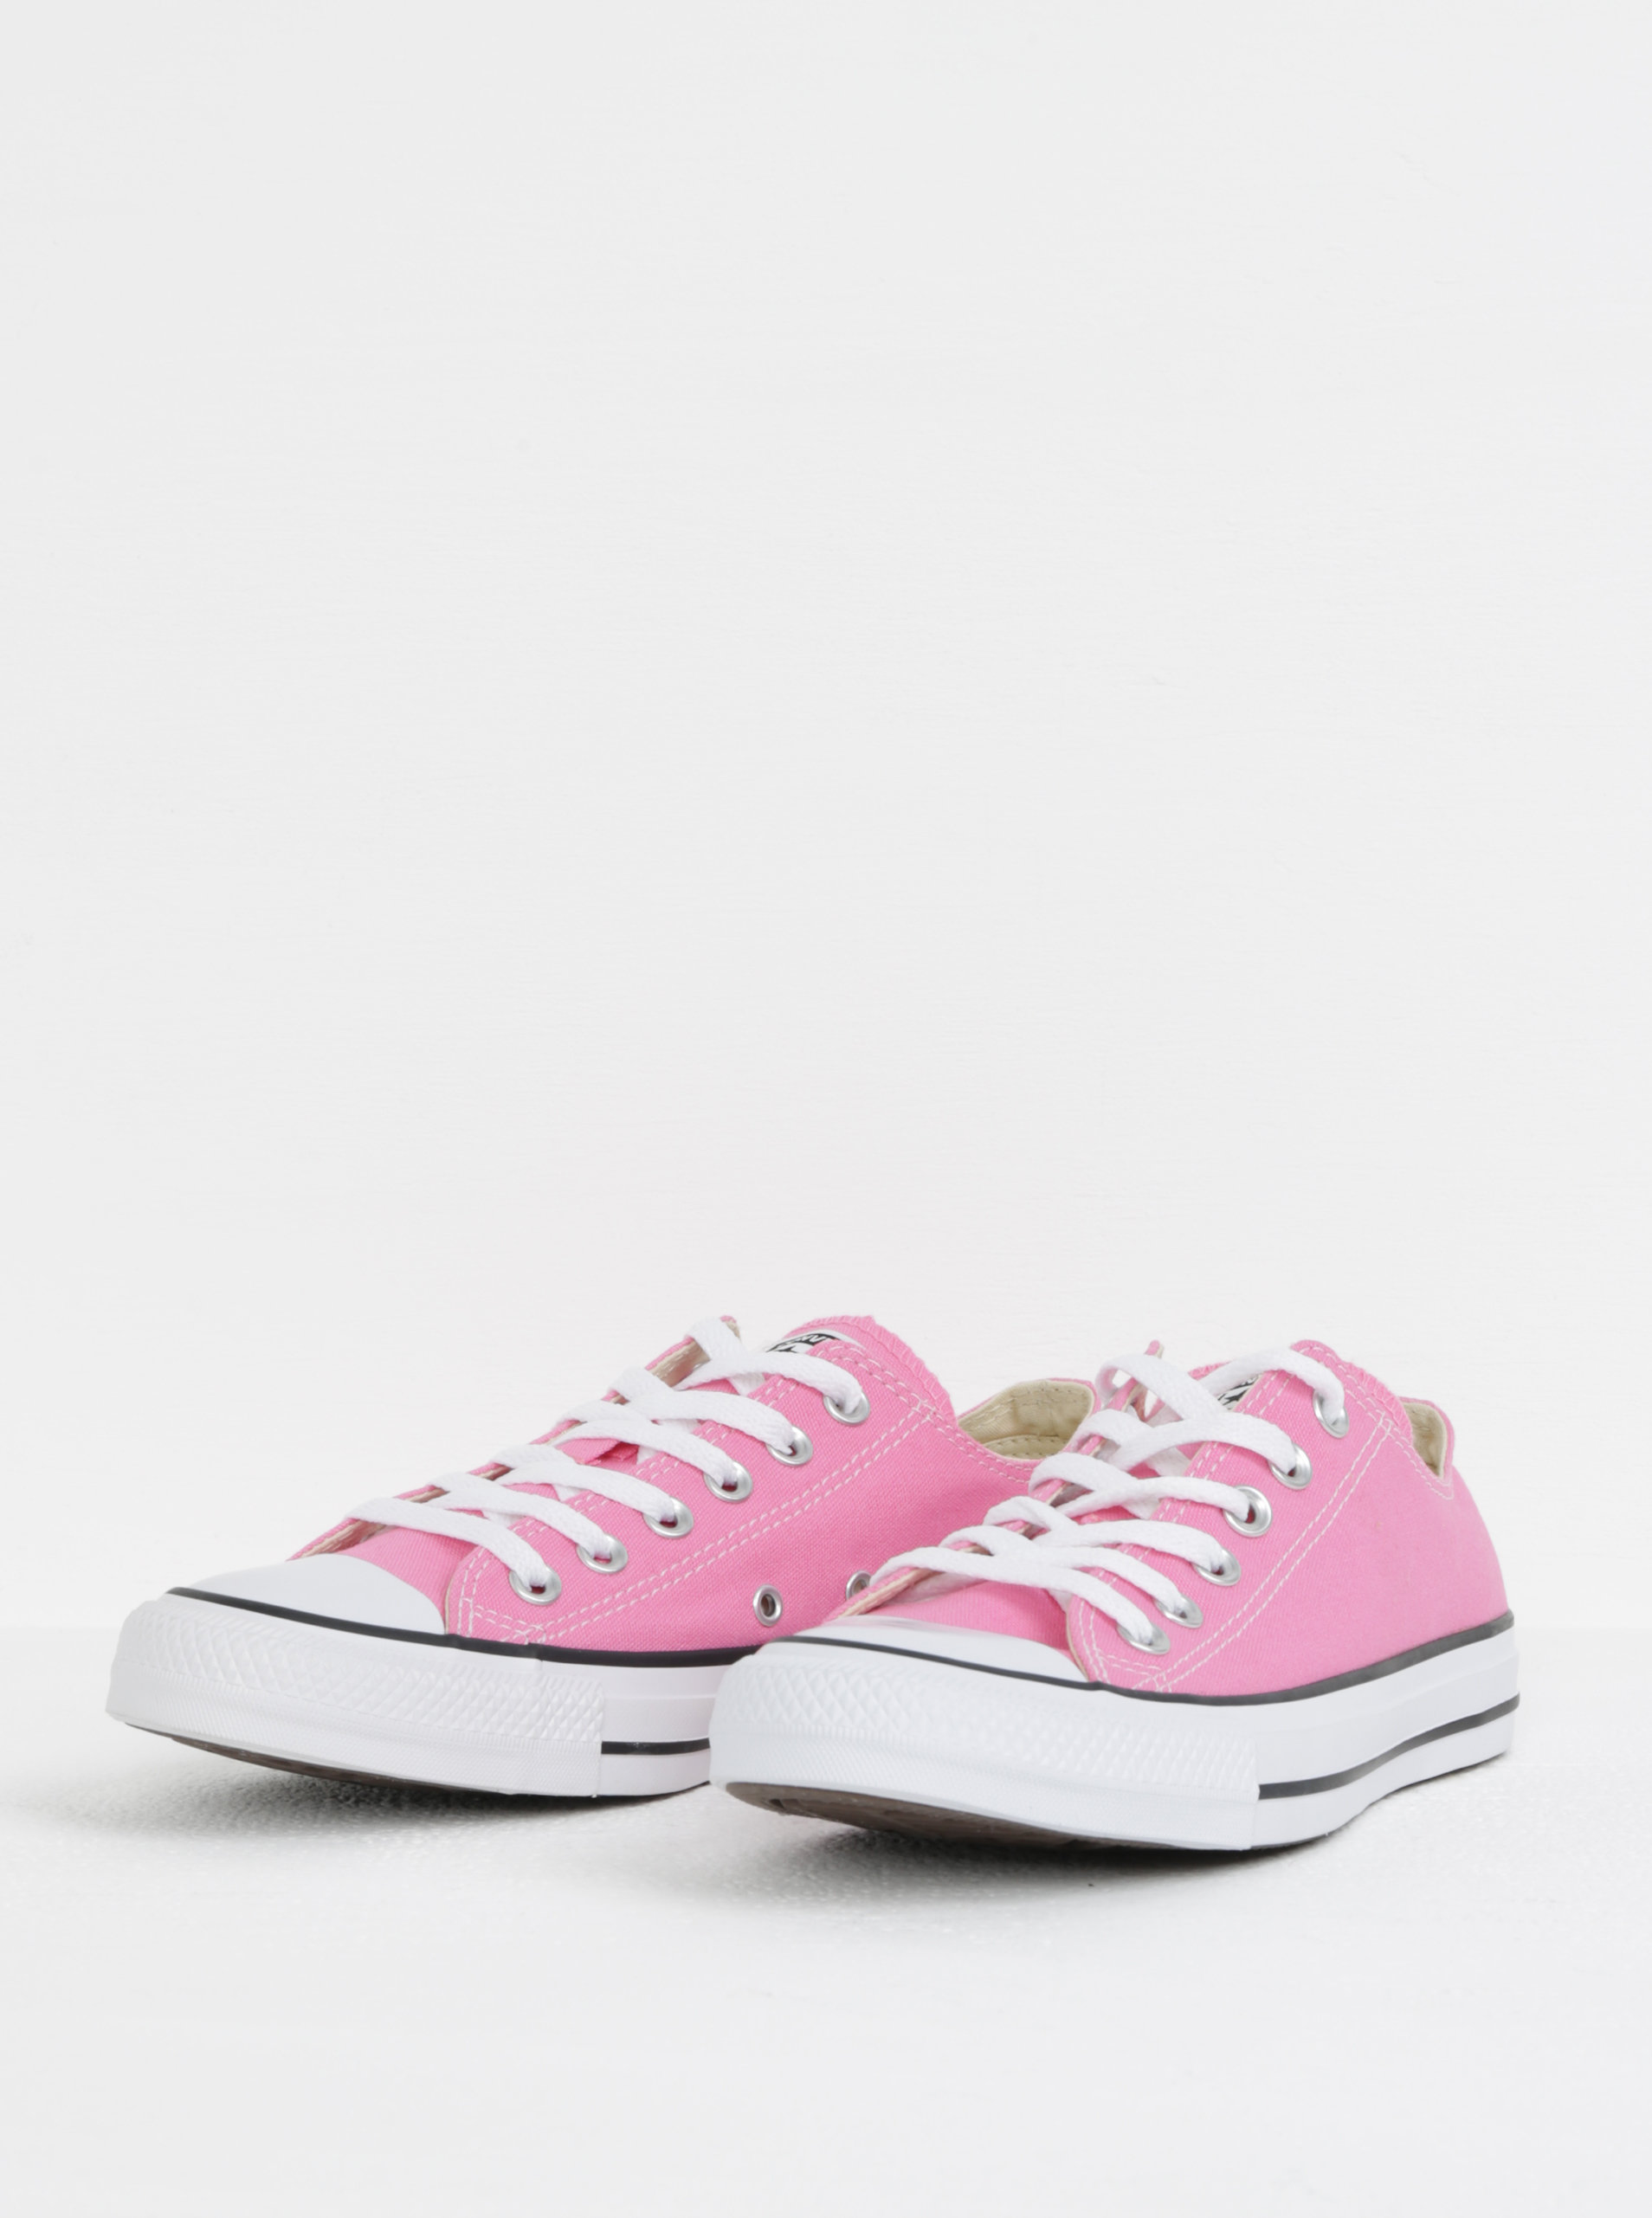 Růžové dámské tenisky Converse Chuck Taylor All Star ... fee829c745c